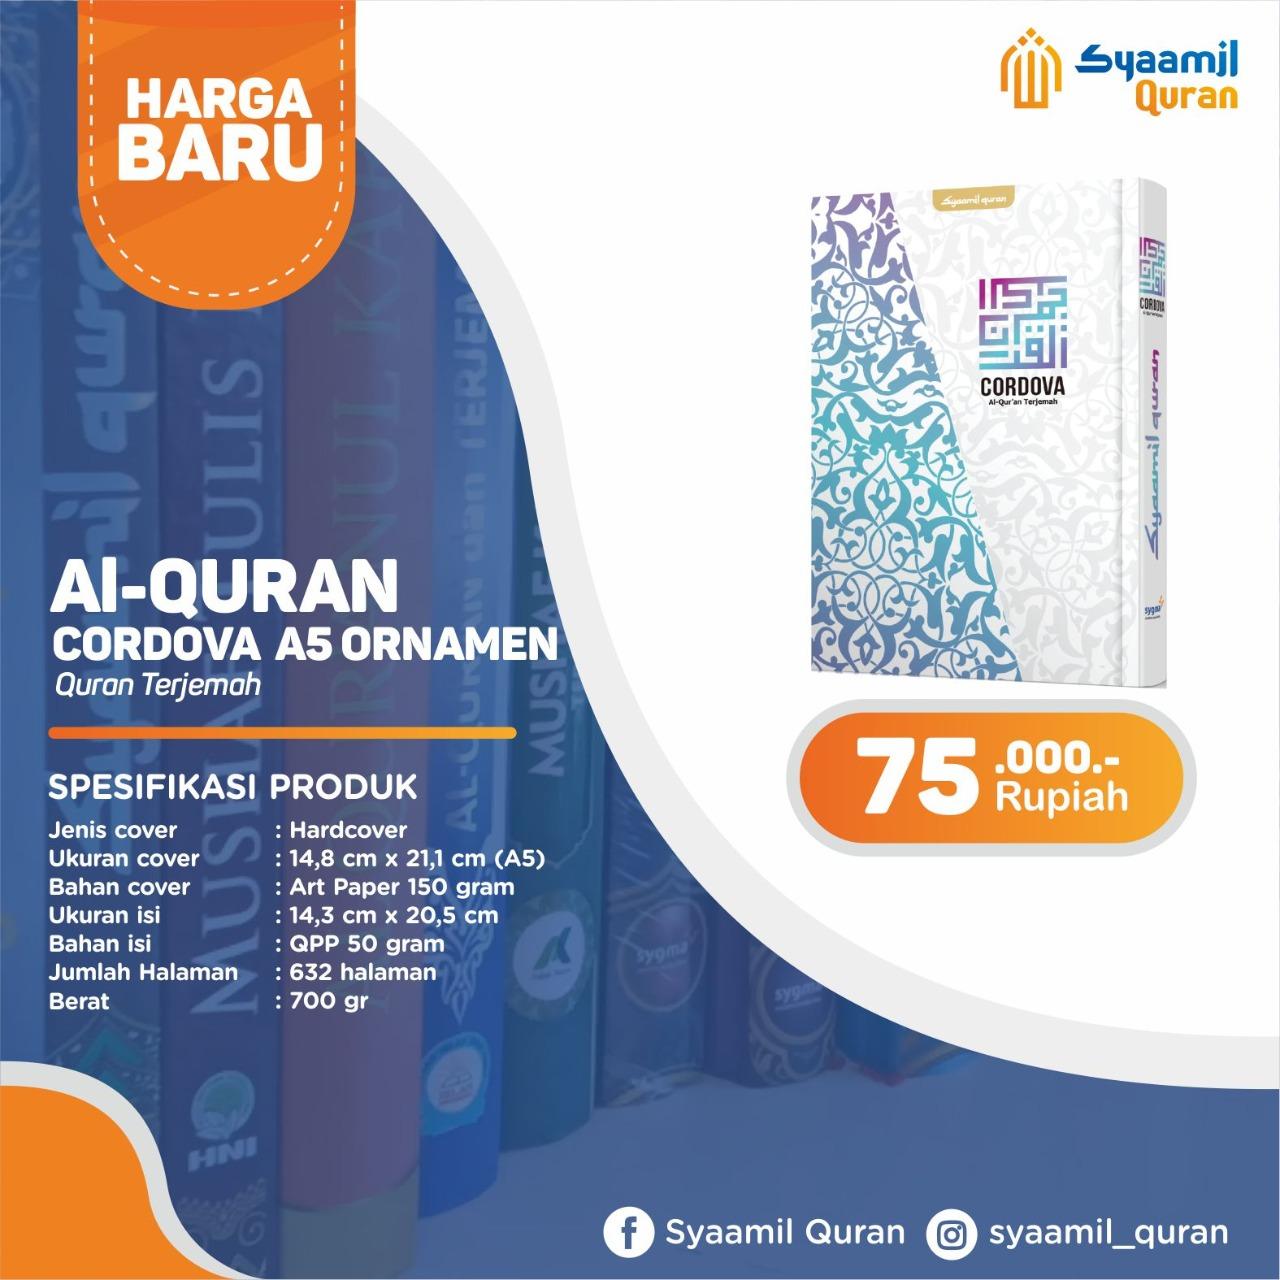 Jual Produk Syaamil Qur'an, Al-Qur'an Cordova A5 Ornamen: Al-Qur'an Terjemah